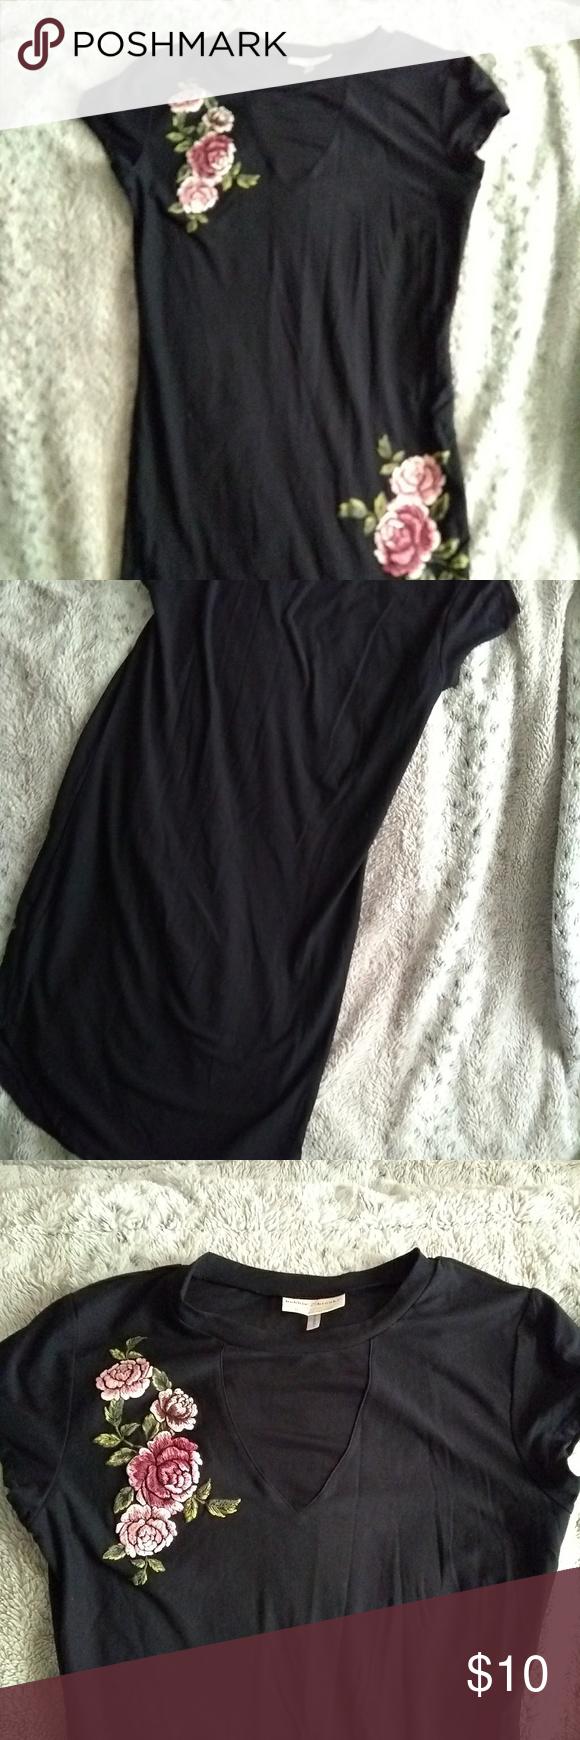 Black With Roses Dress Clothes Design Dresses Fashion Design [ 1740 x 580 Pixel ]